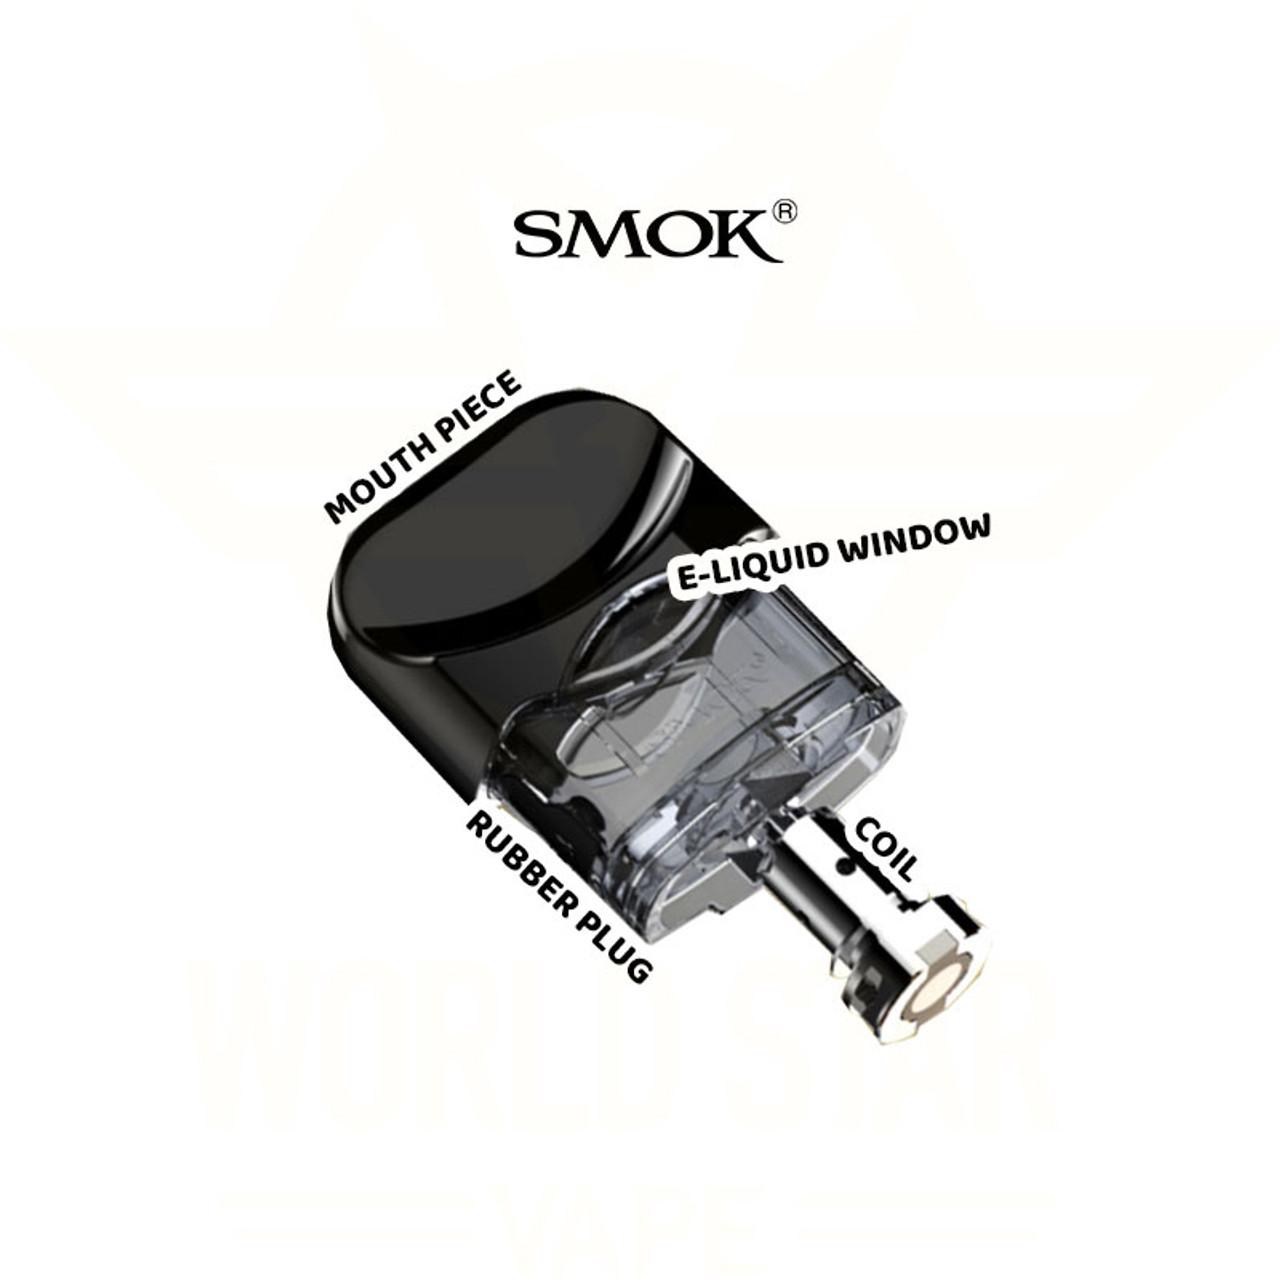 SMOK Nord Replacement Pod Cartridge Wholesale - Worldstarvape